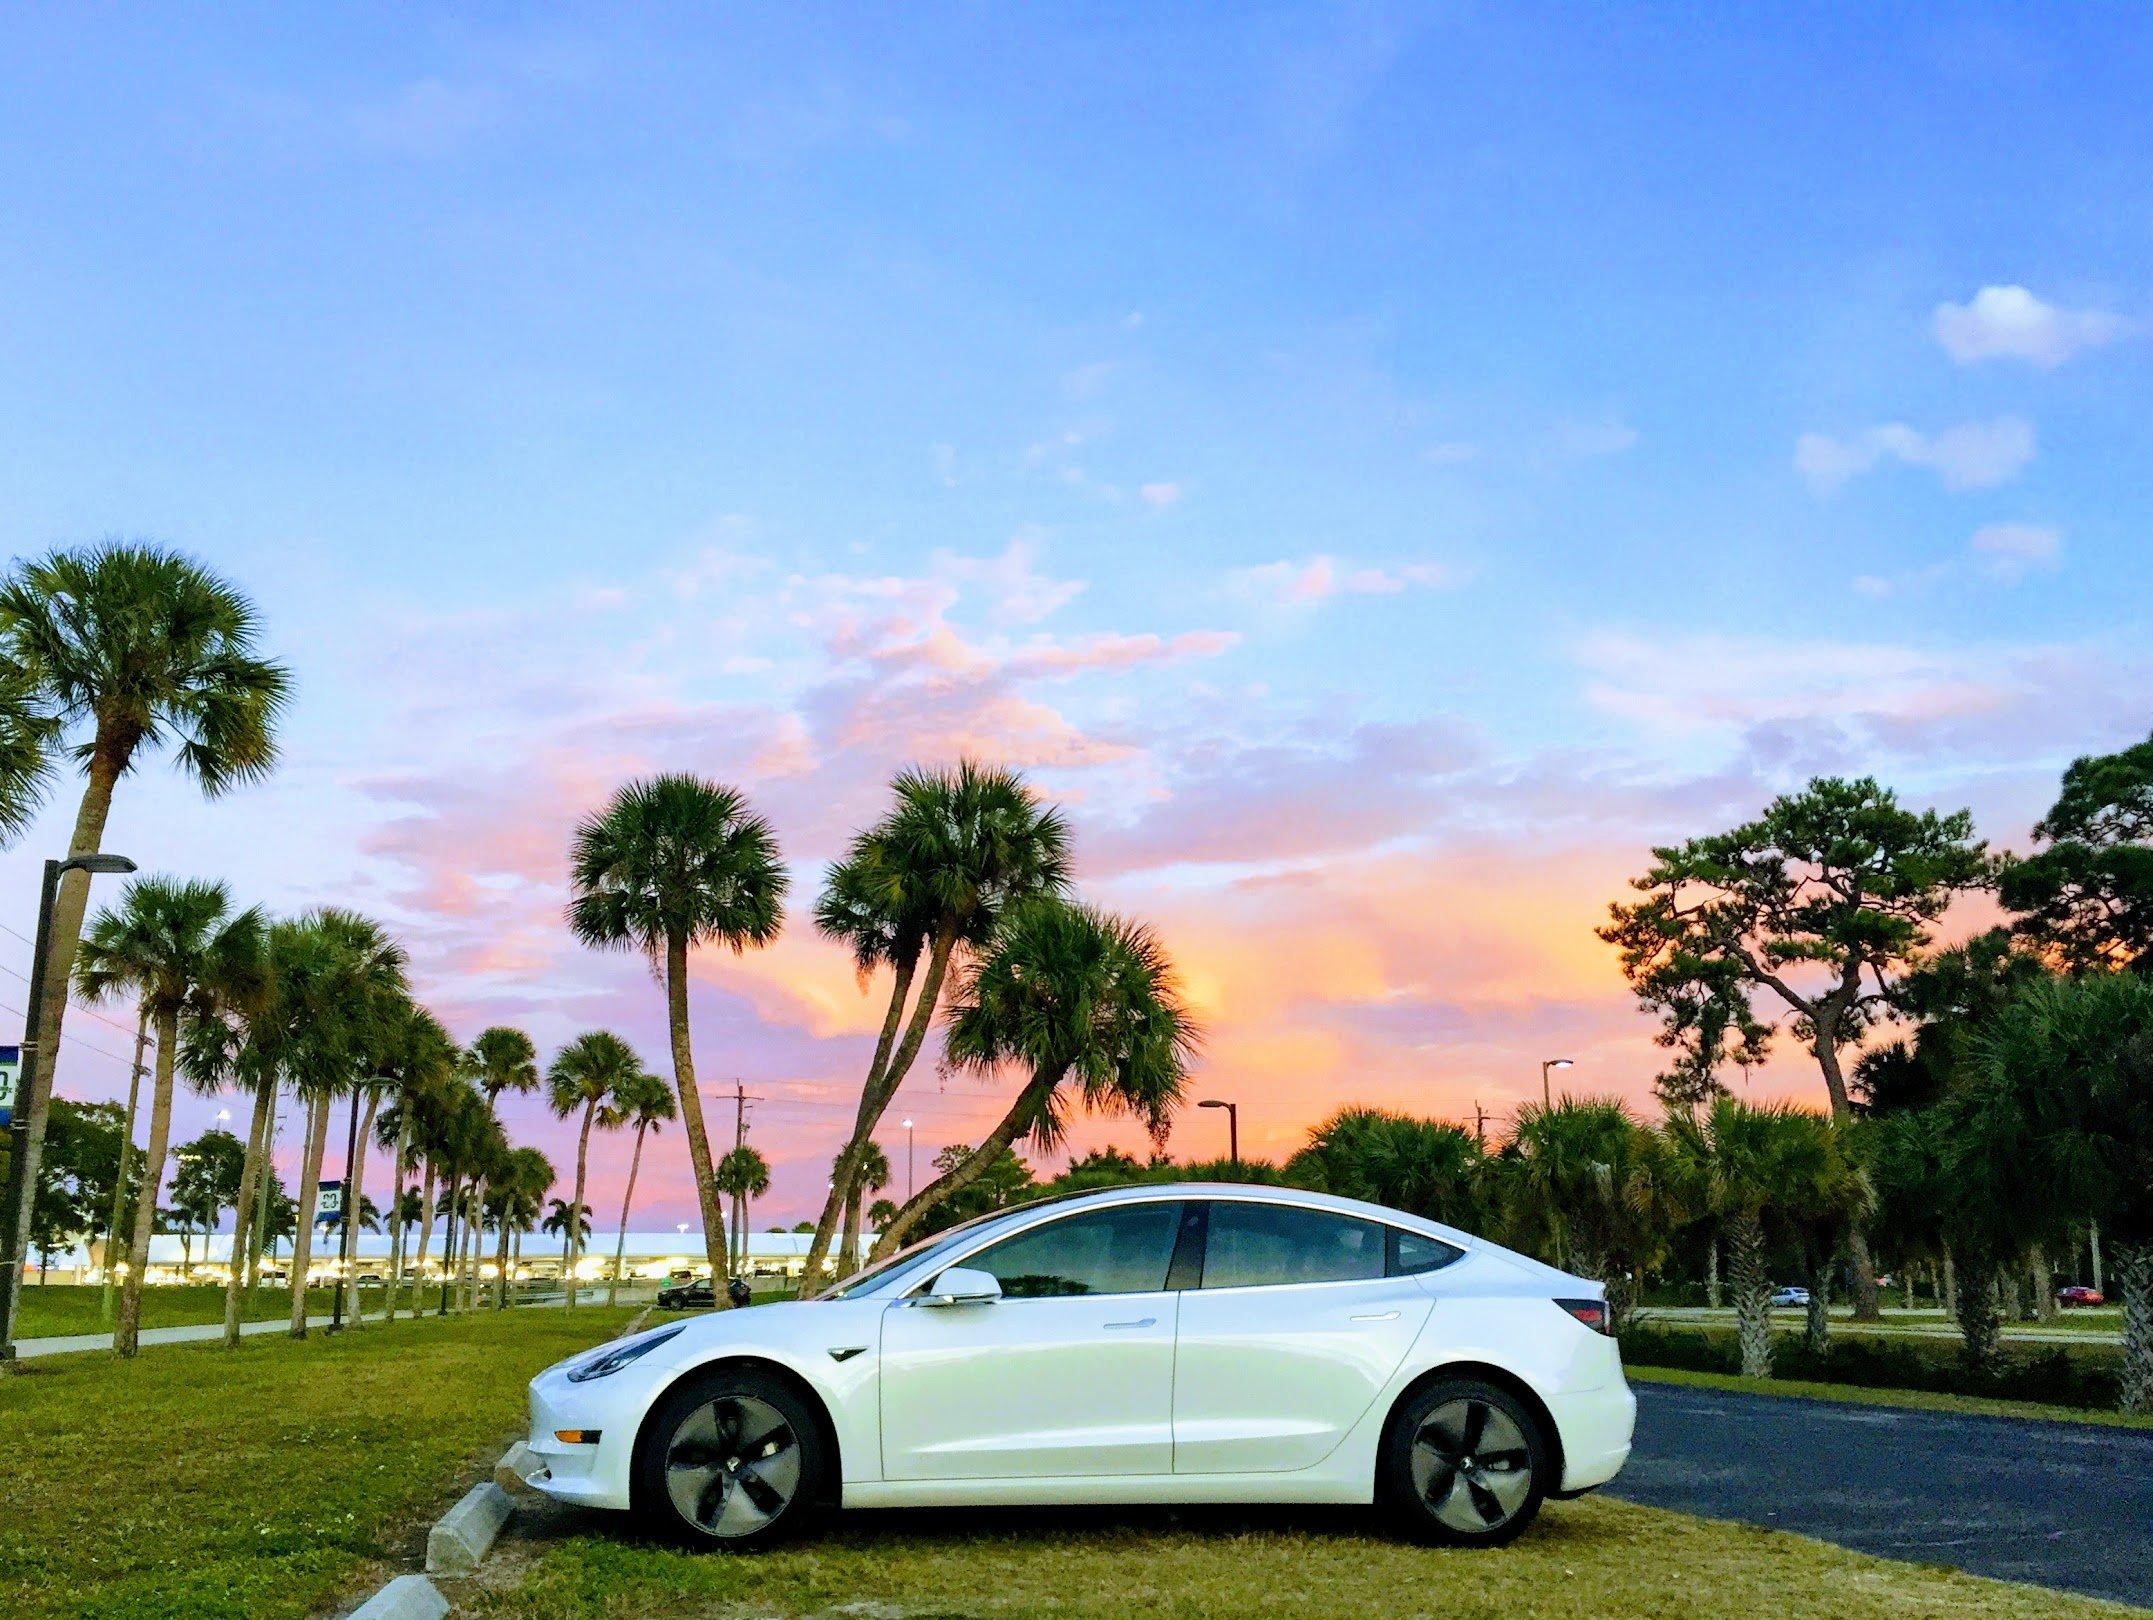 Tesla-Model-3-White-Florida-Sunset-New-College